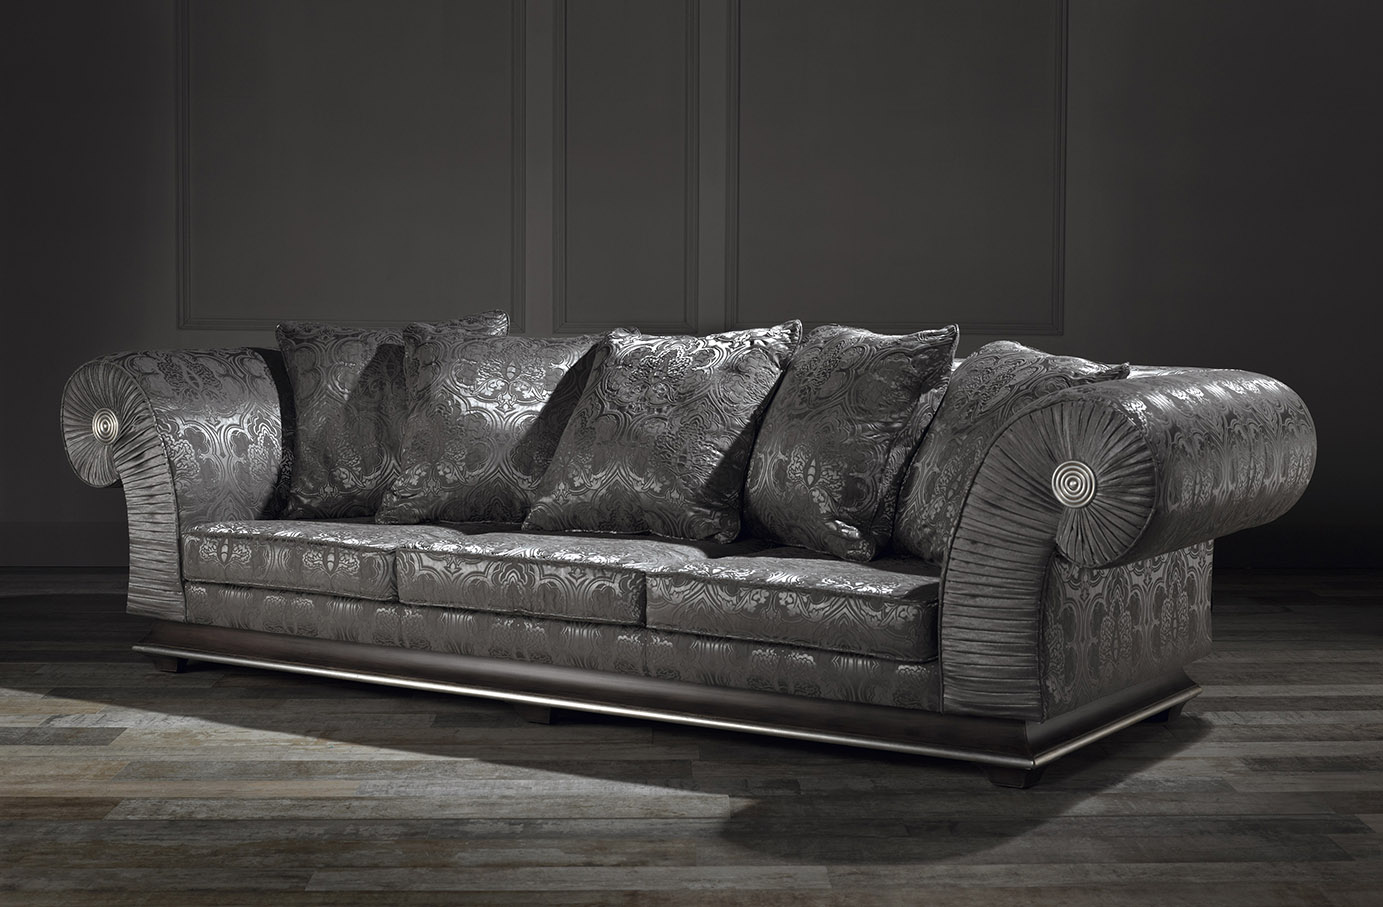 The Corner Sofa & Curved Sofa